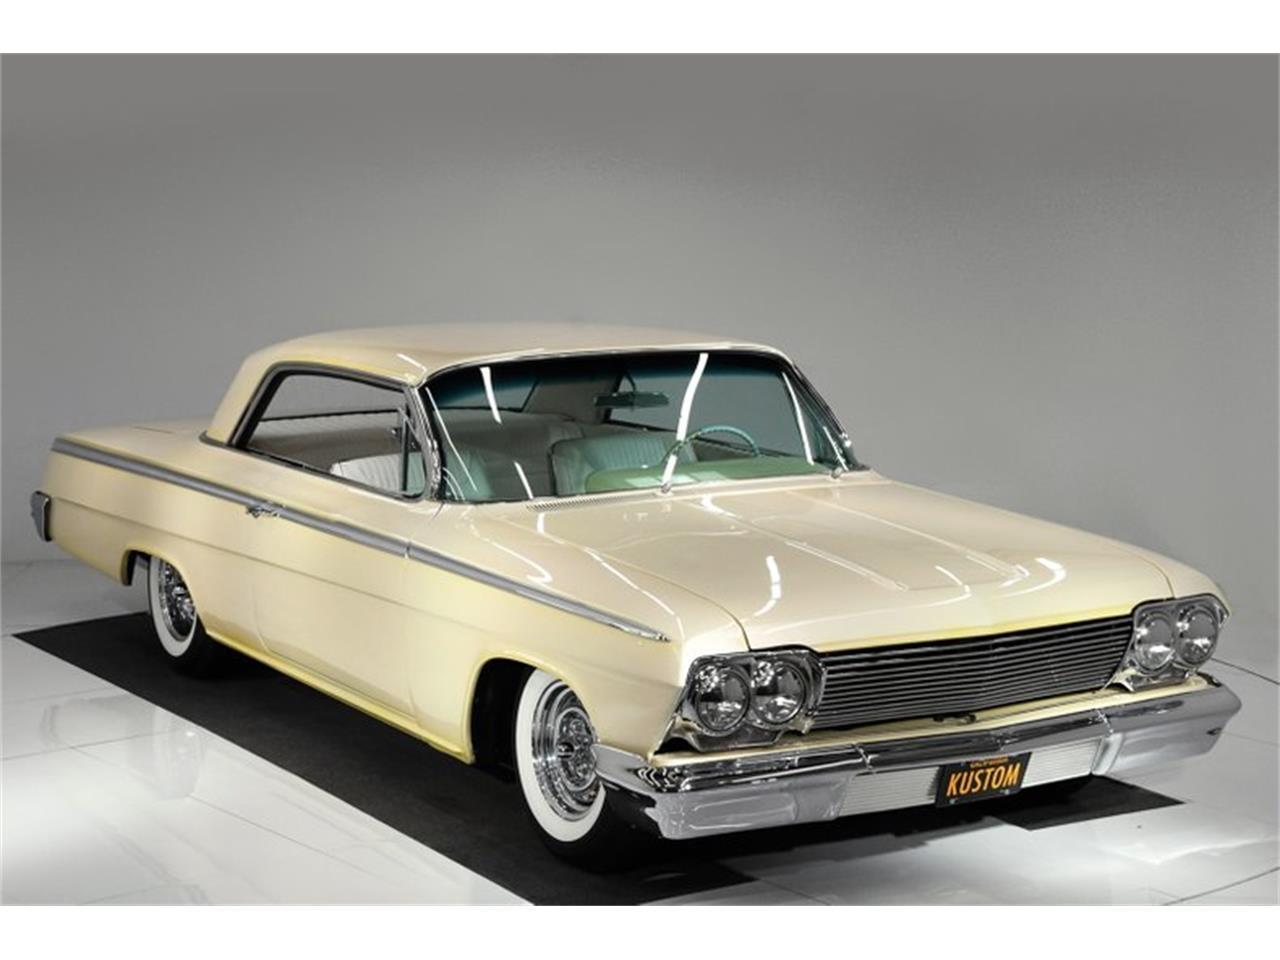 Large Picture of '62 Impala located in Illinois - $51,998.00 - QIVA